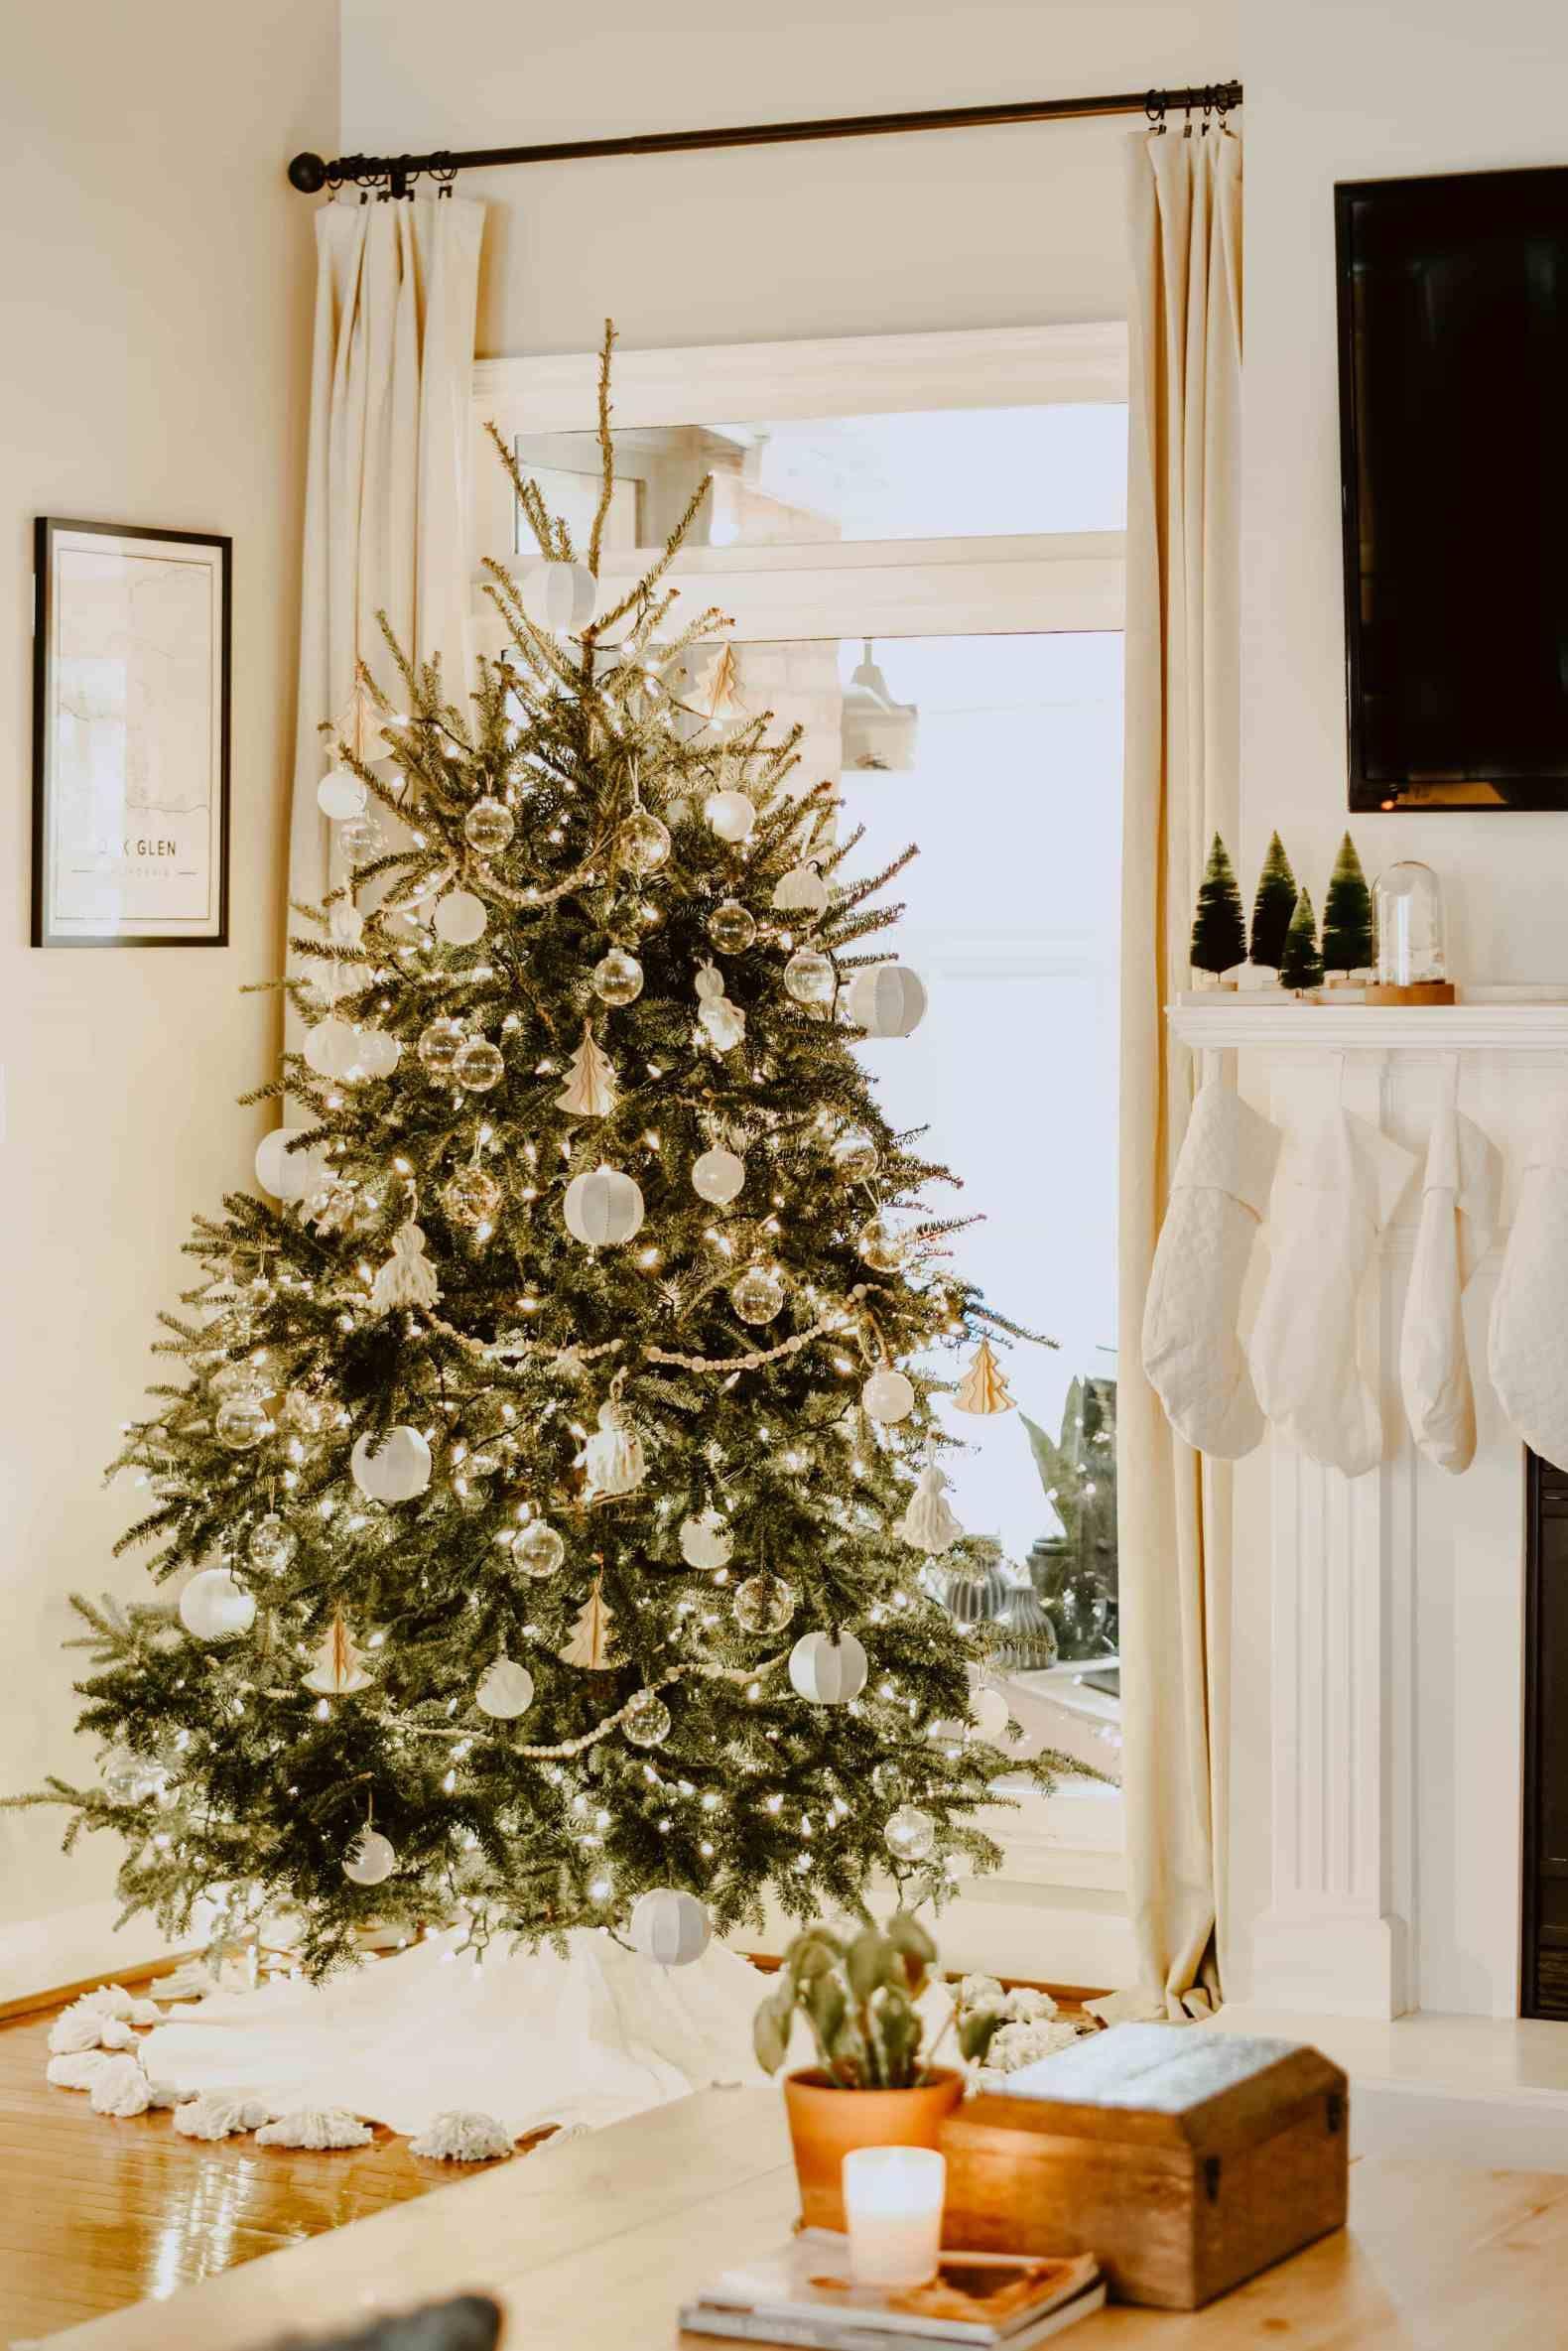 DIY Tasseled Tree Skirt for a Simple Christmas Tree ...